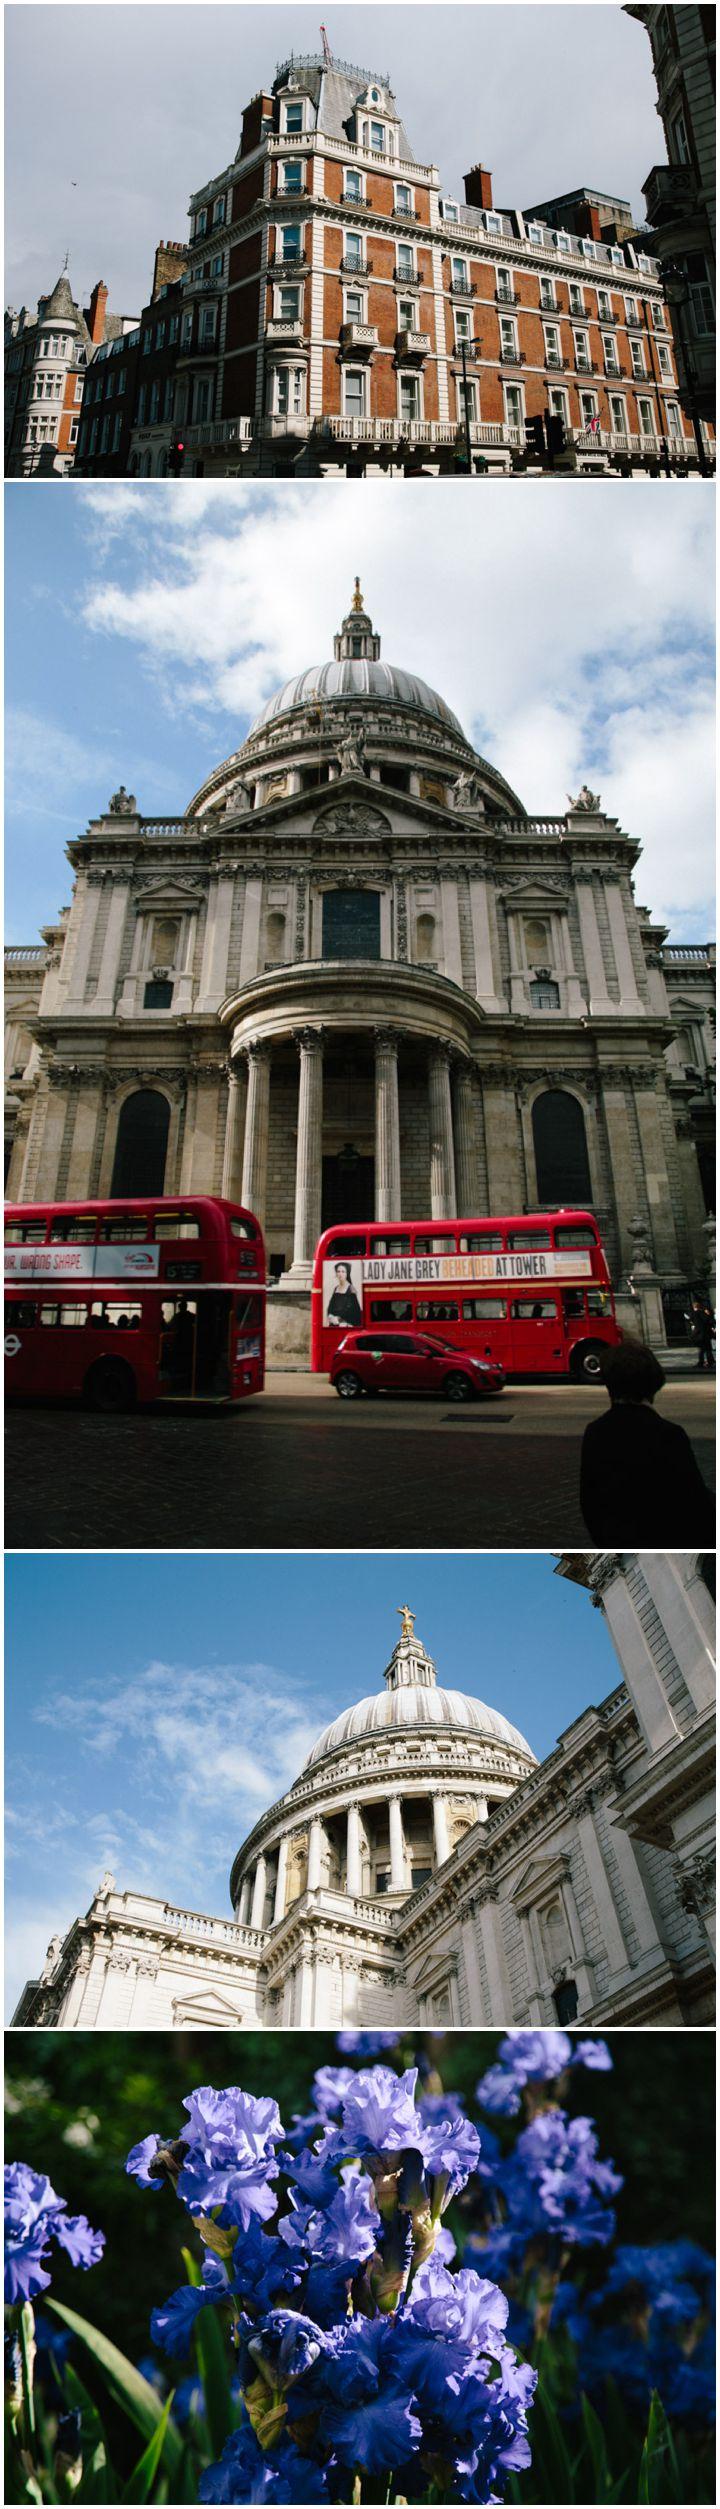 England London Travel Photographer-19.jpg